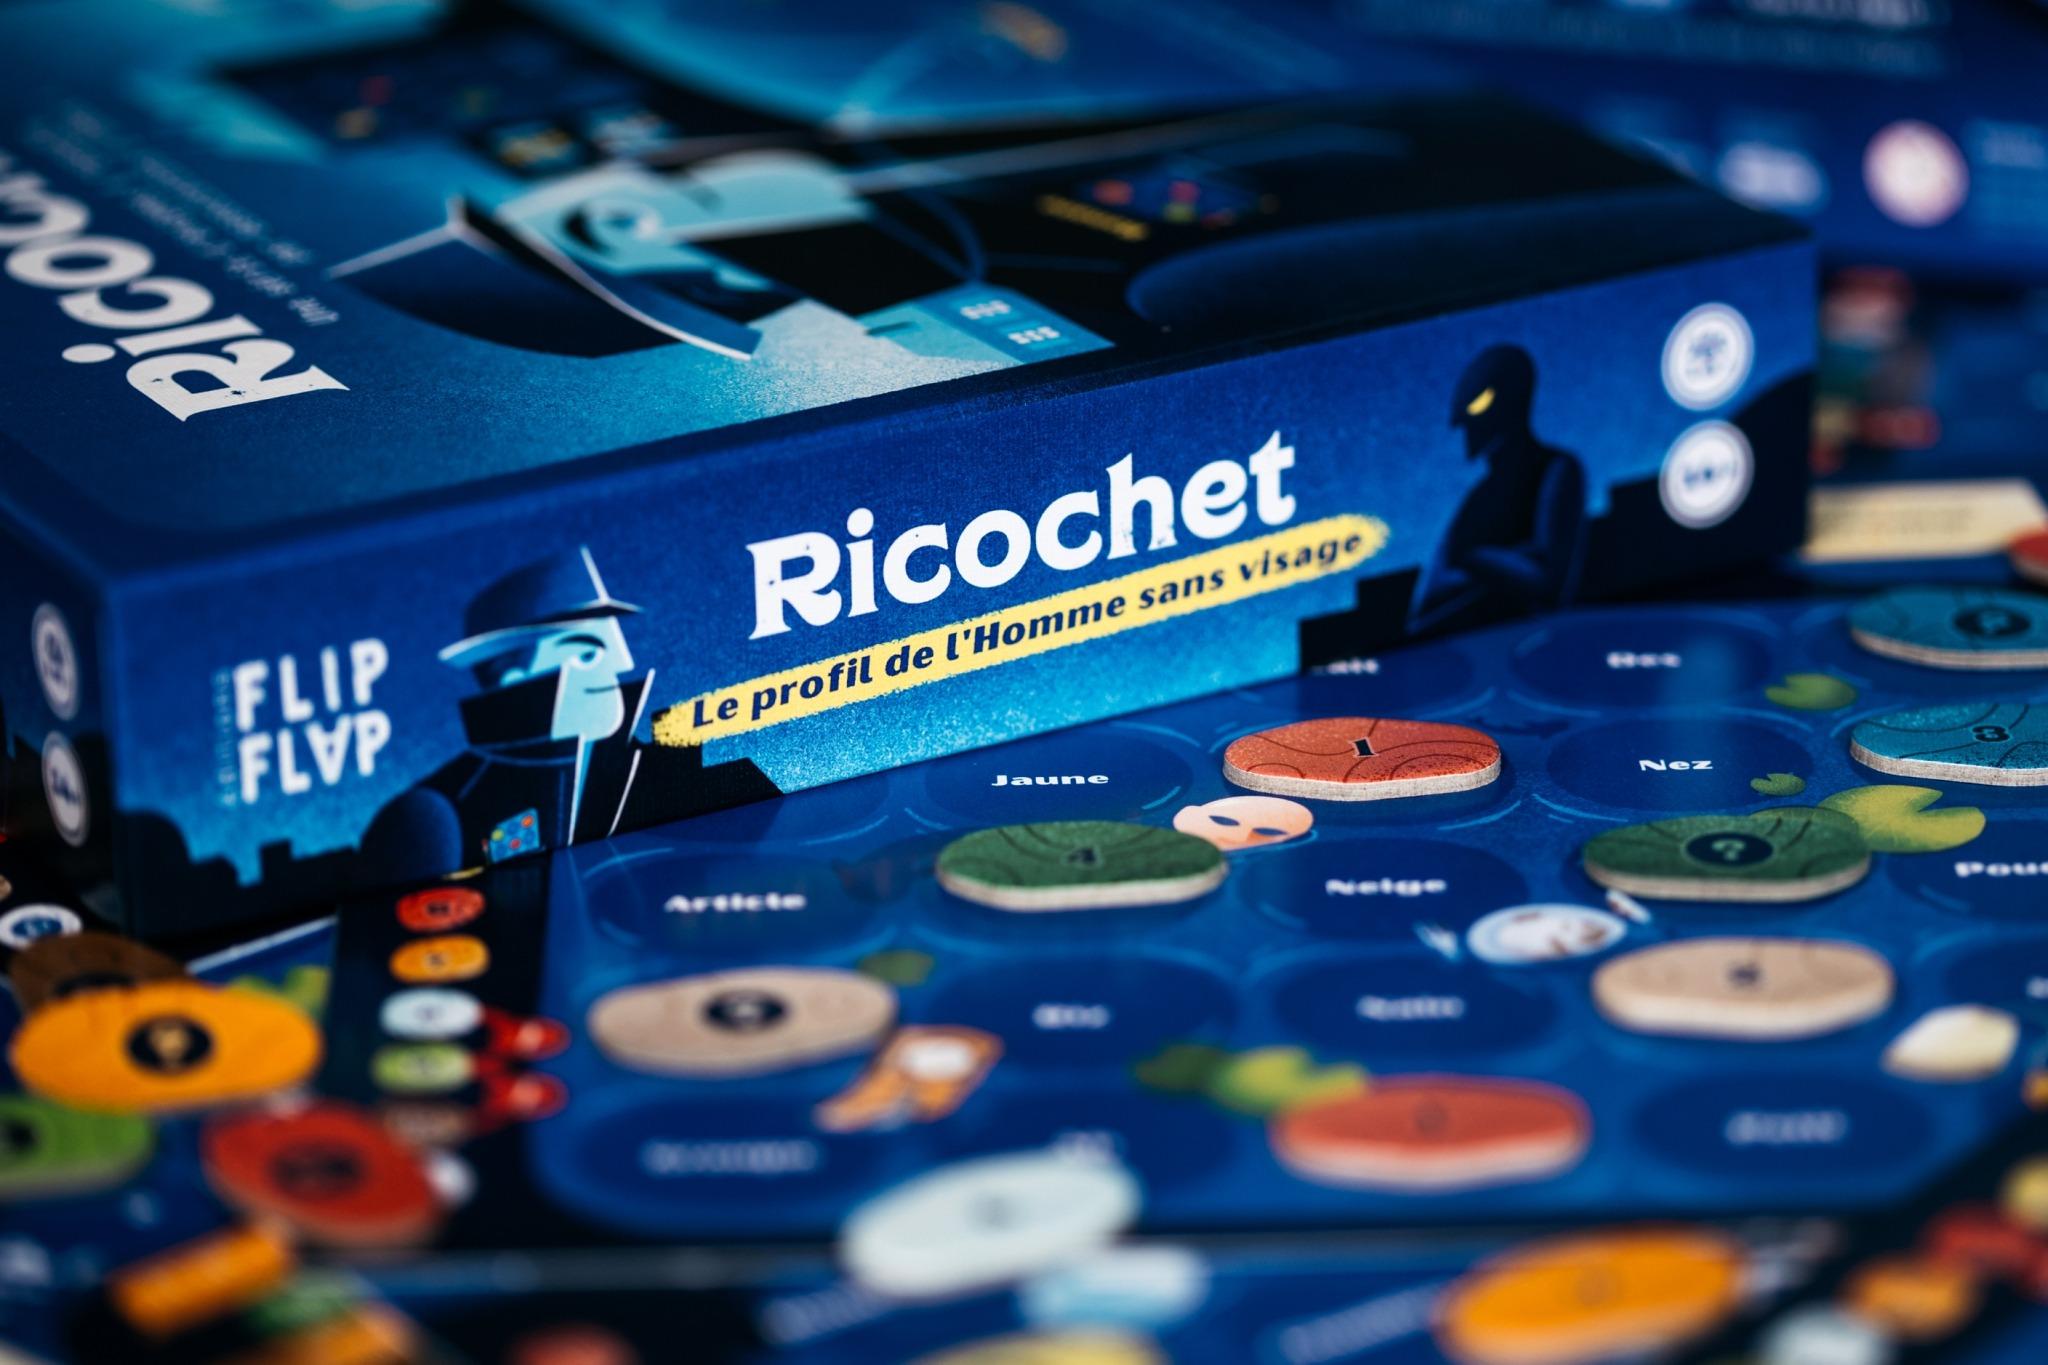 Ricochet flip flap blackrockgames jeu de société